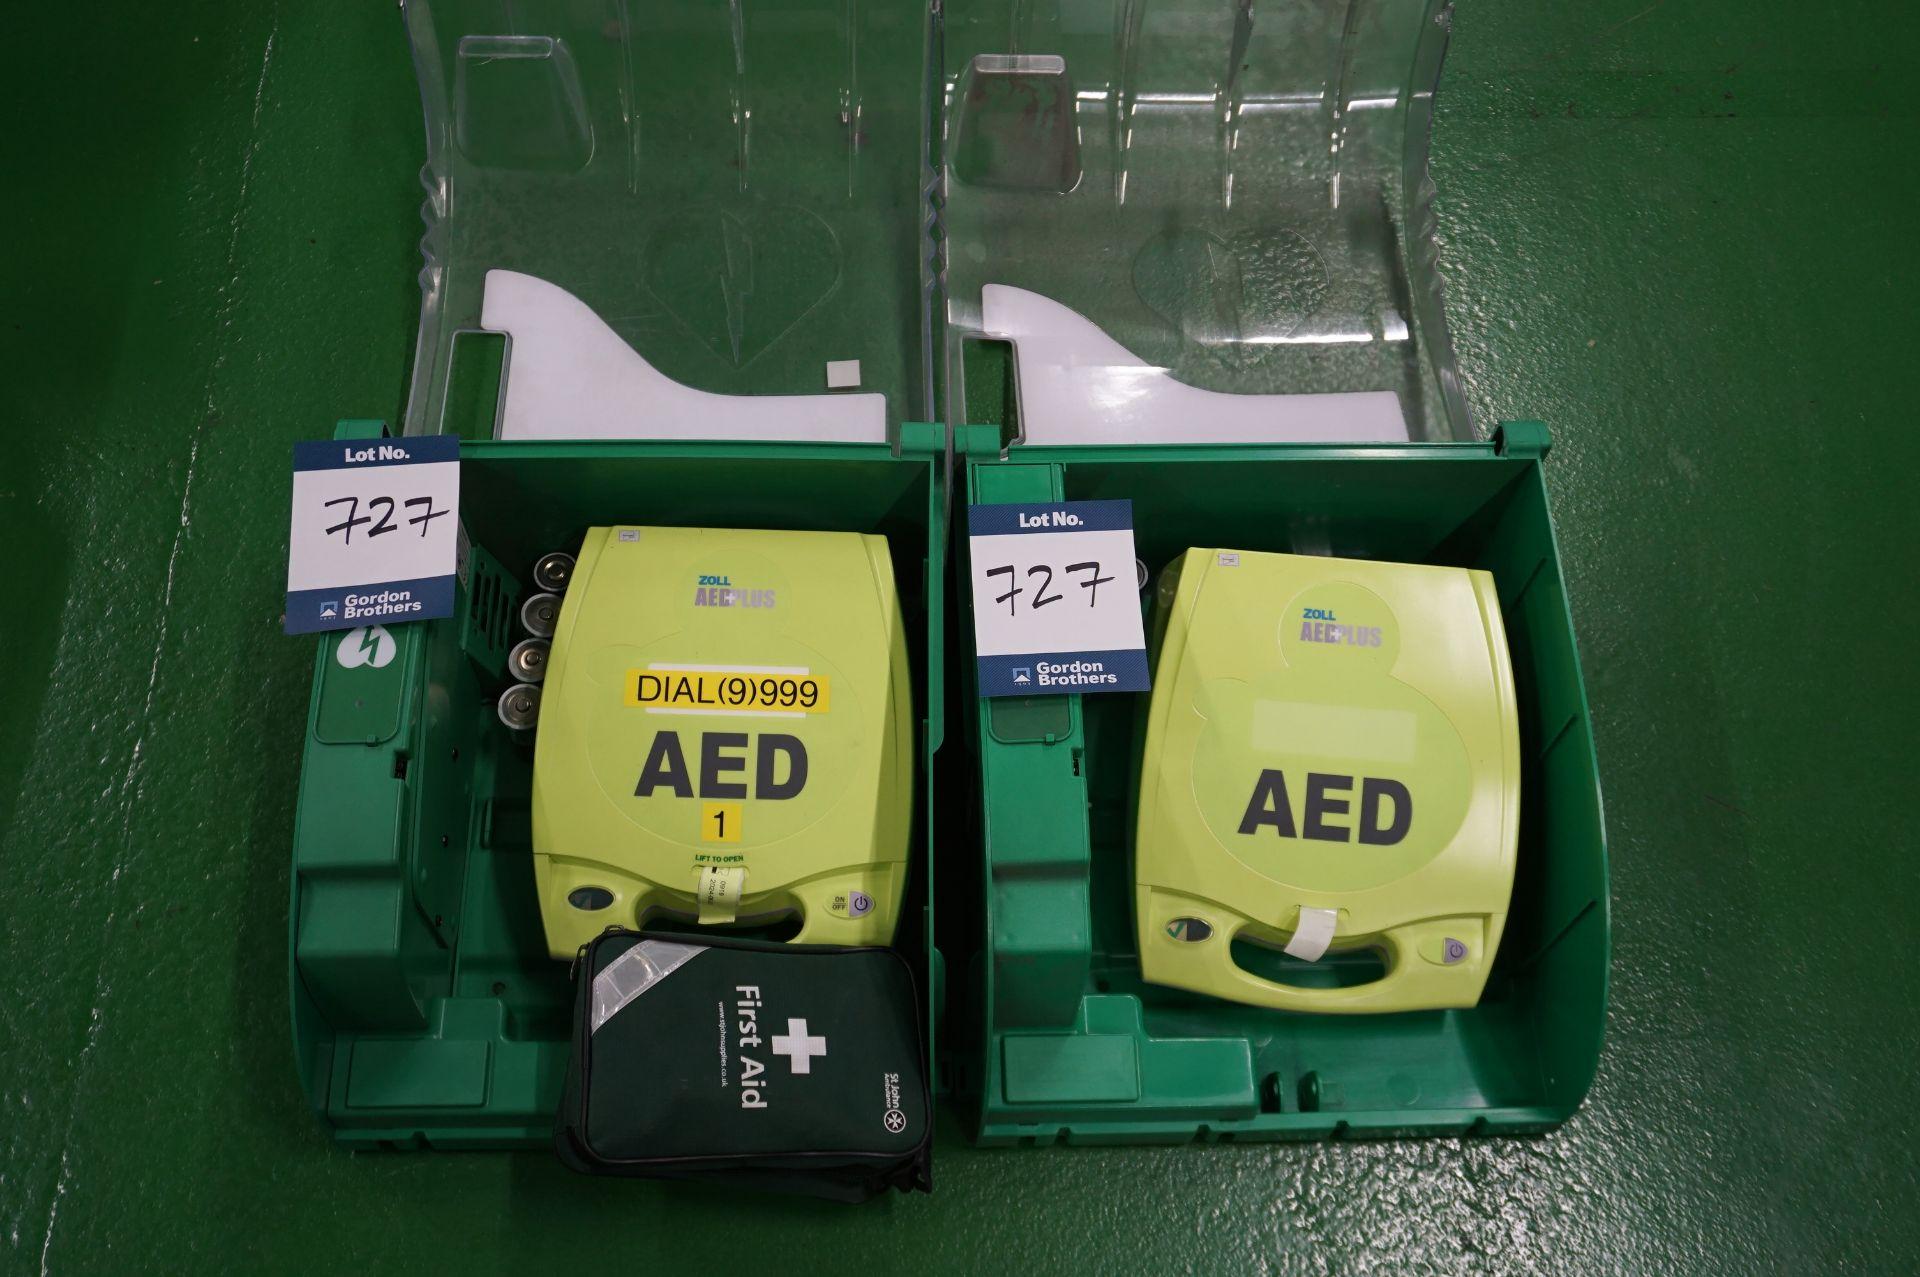 2 x Zoll AEDPLUS Avia 100:X2A100-XX100 battery operated defibrillator